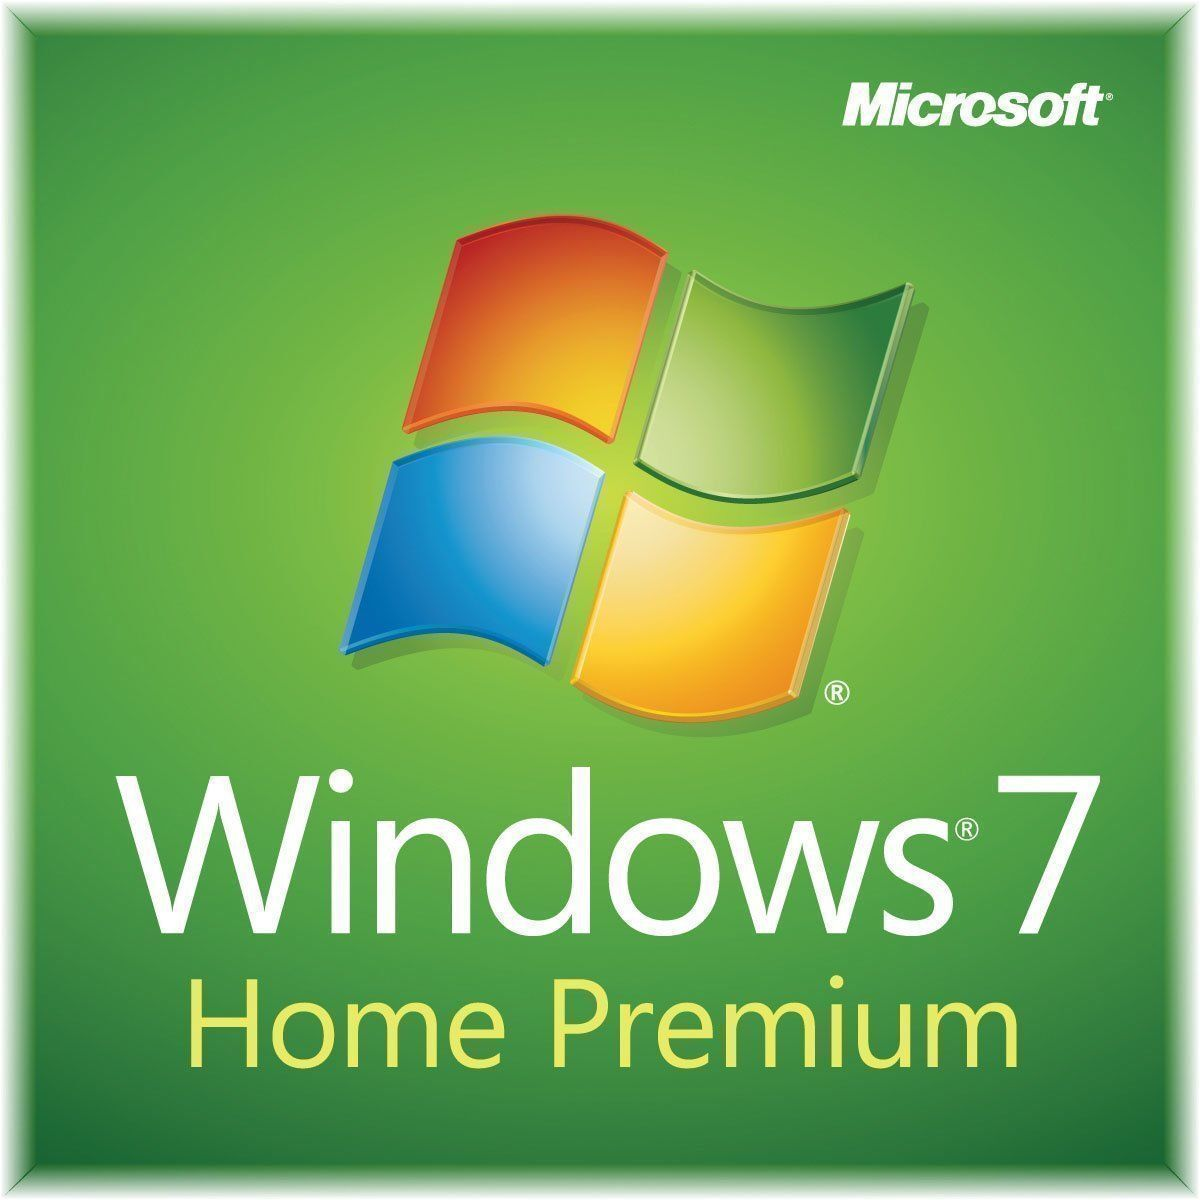 Microsoft Windows 7 Home Premium 32 64 Bit Full Version S...